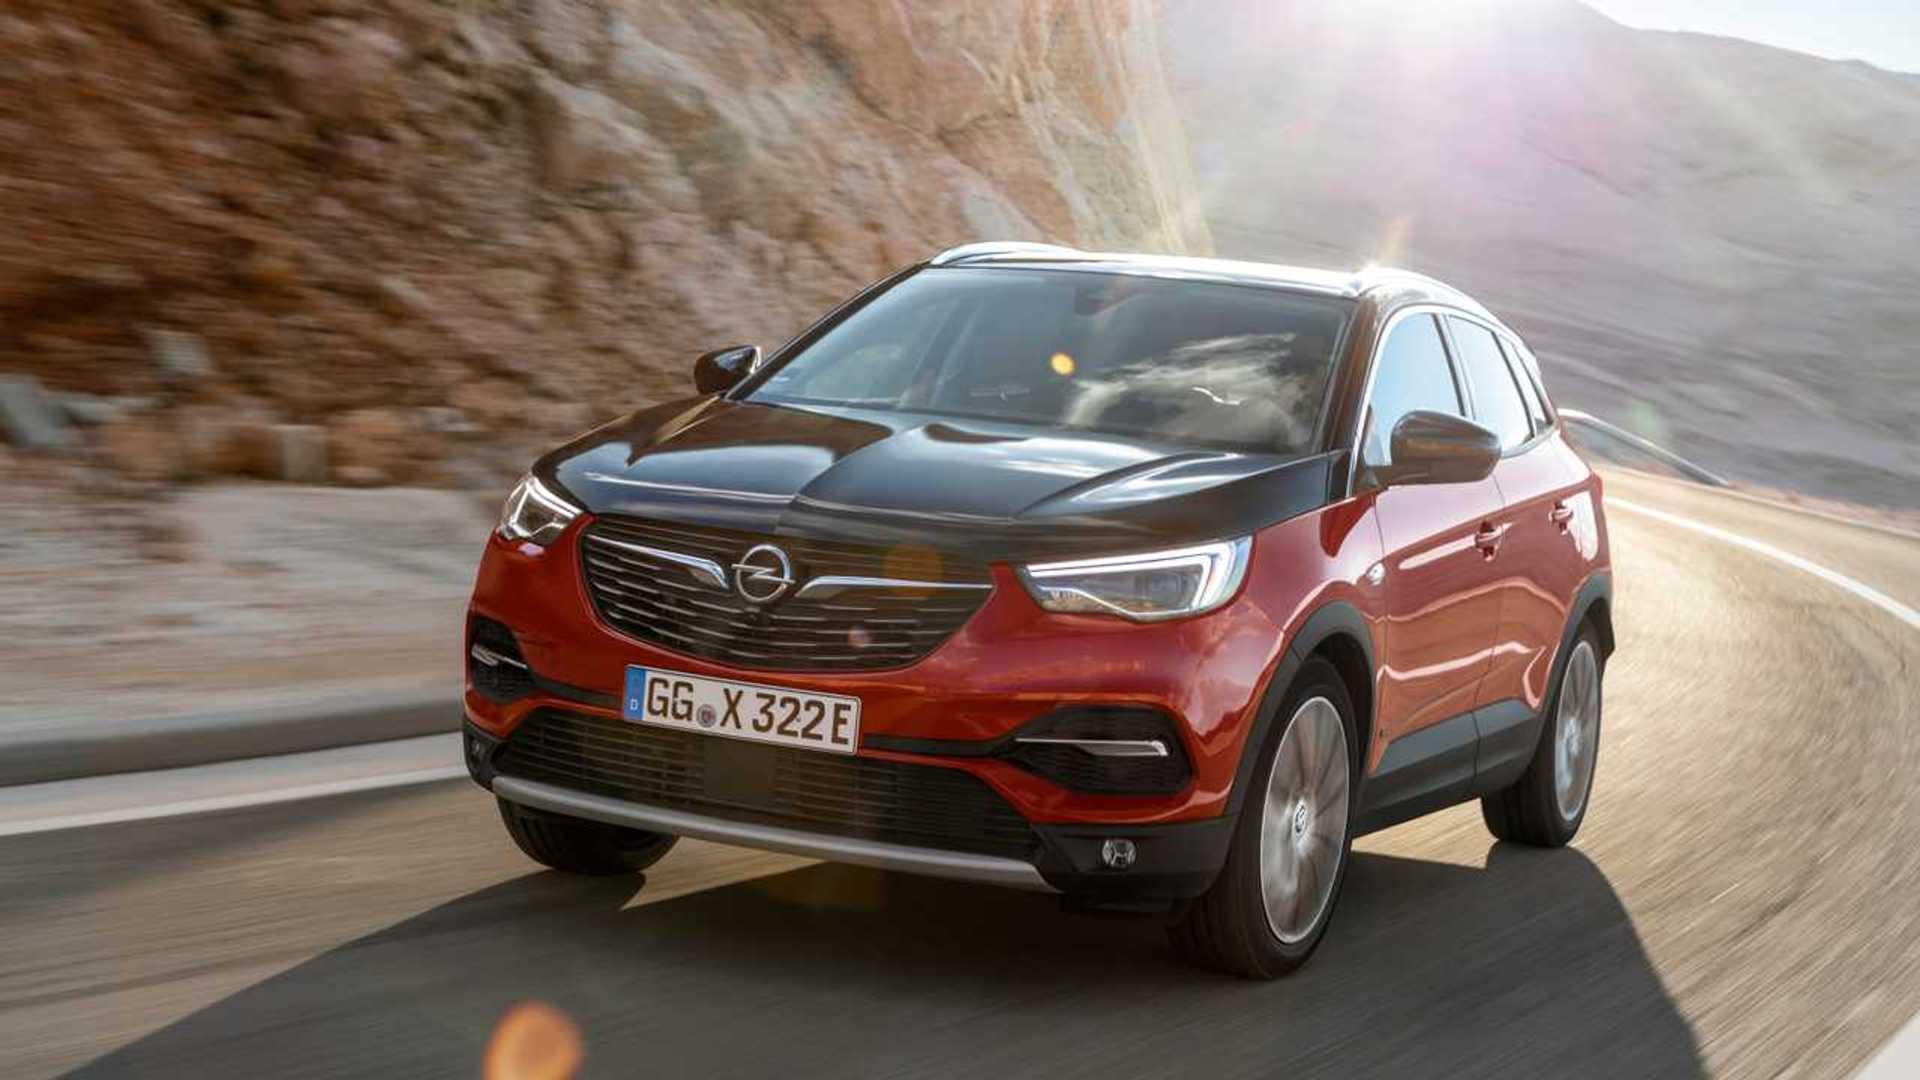 2019 Opel Grandland X Hybrid4 Release Date >> Opel Grandland X Plug In Hybrid4 Unveiled With 300 Hp And Awd